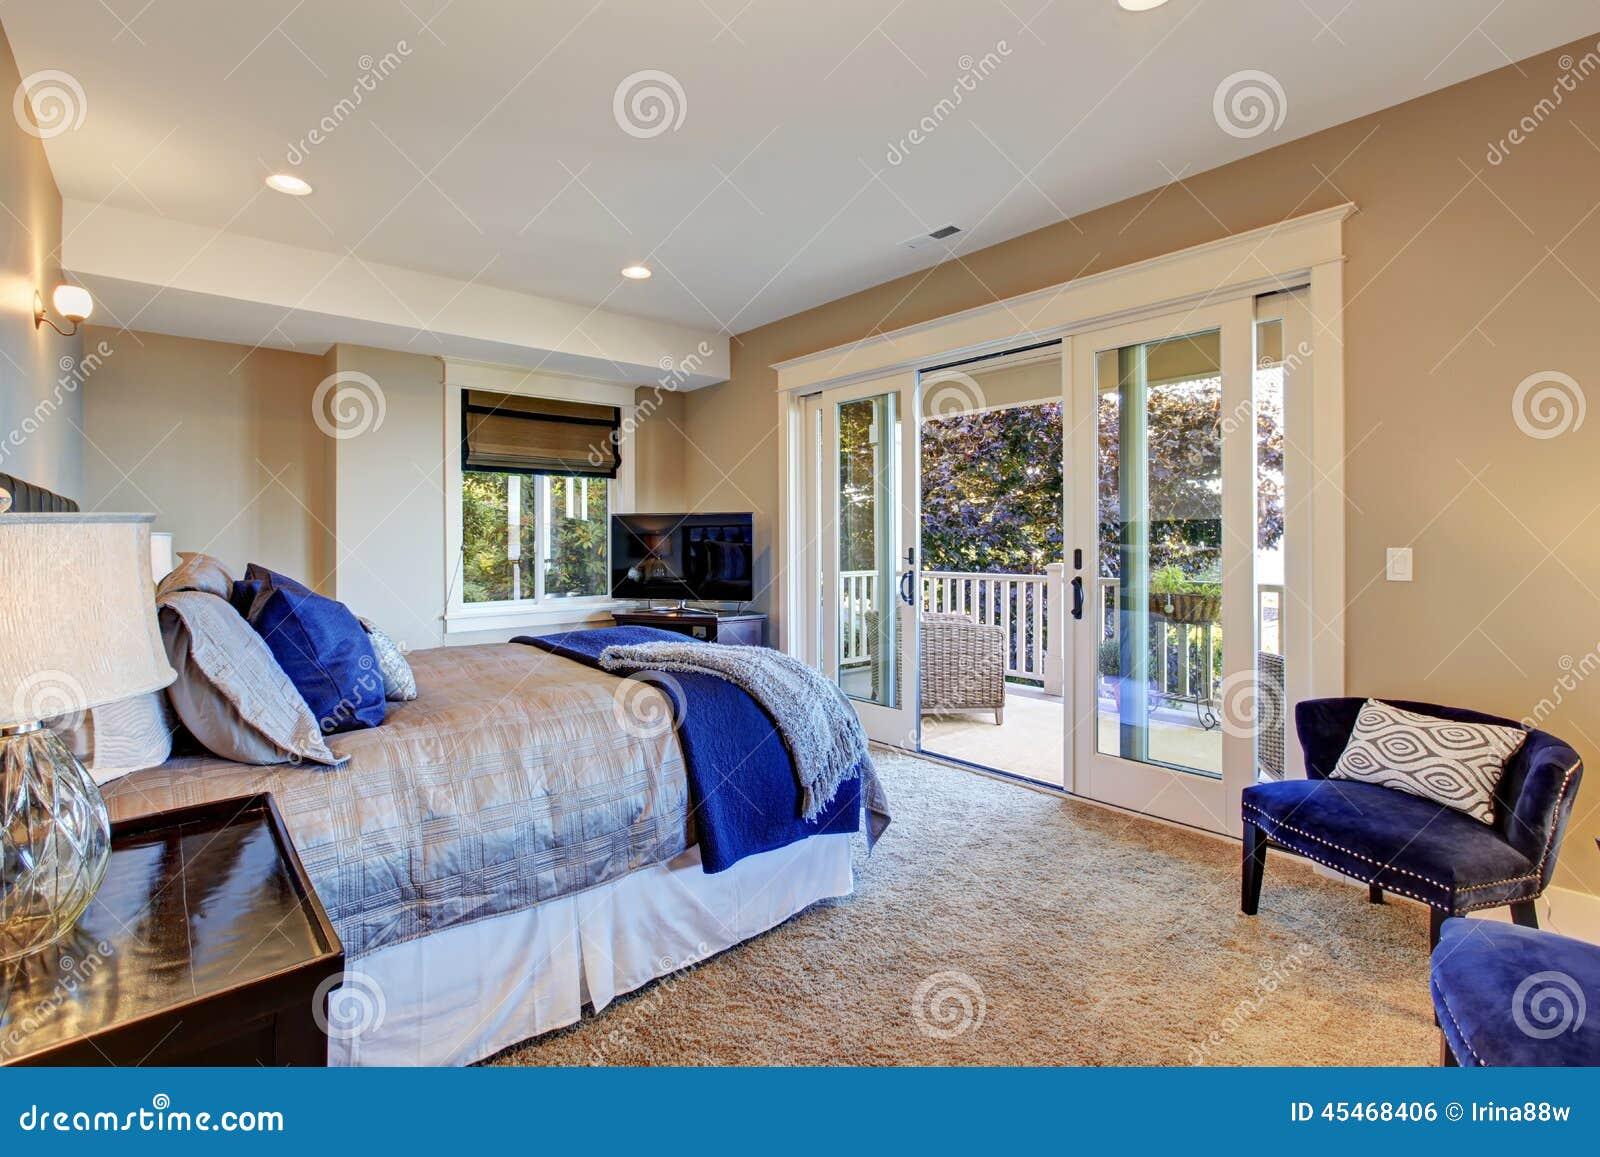 12 x 12 deck plans bing images for 12x16 master bedroom